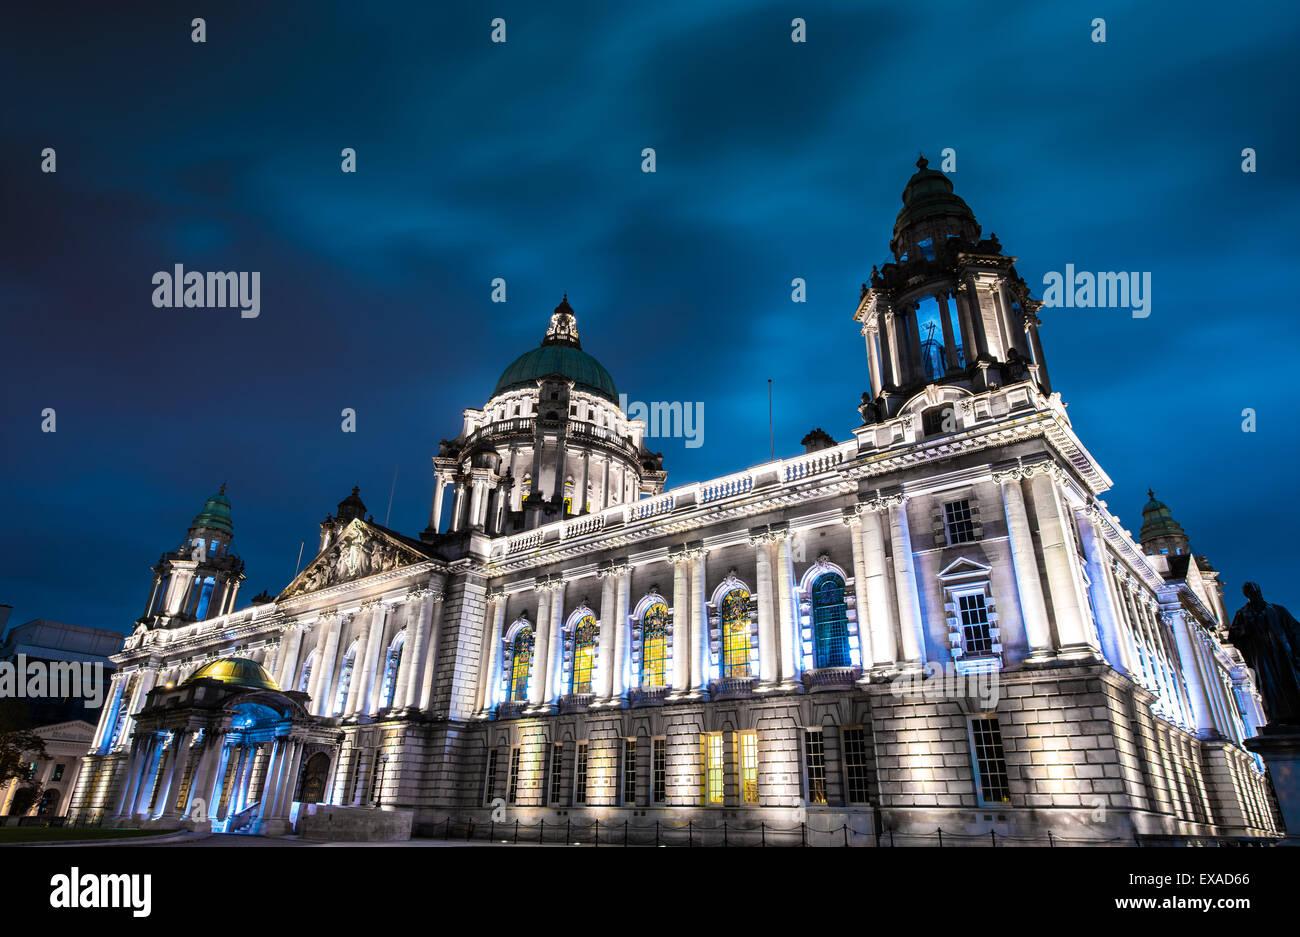 The city hall of Belfast North Ireland, Belfast city, Northern Ireland, UK - Stock Image